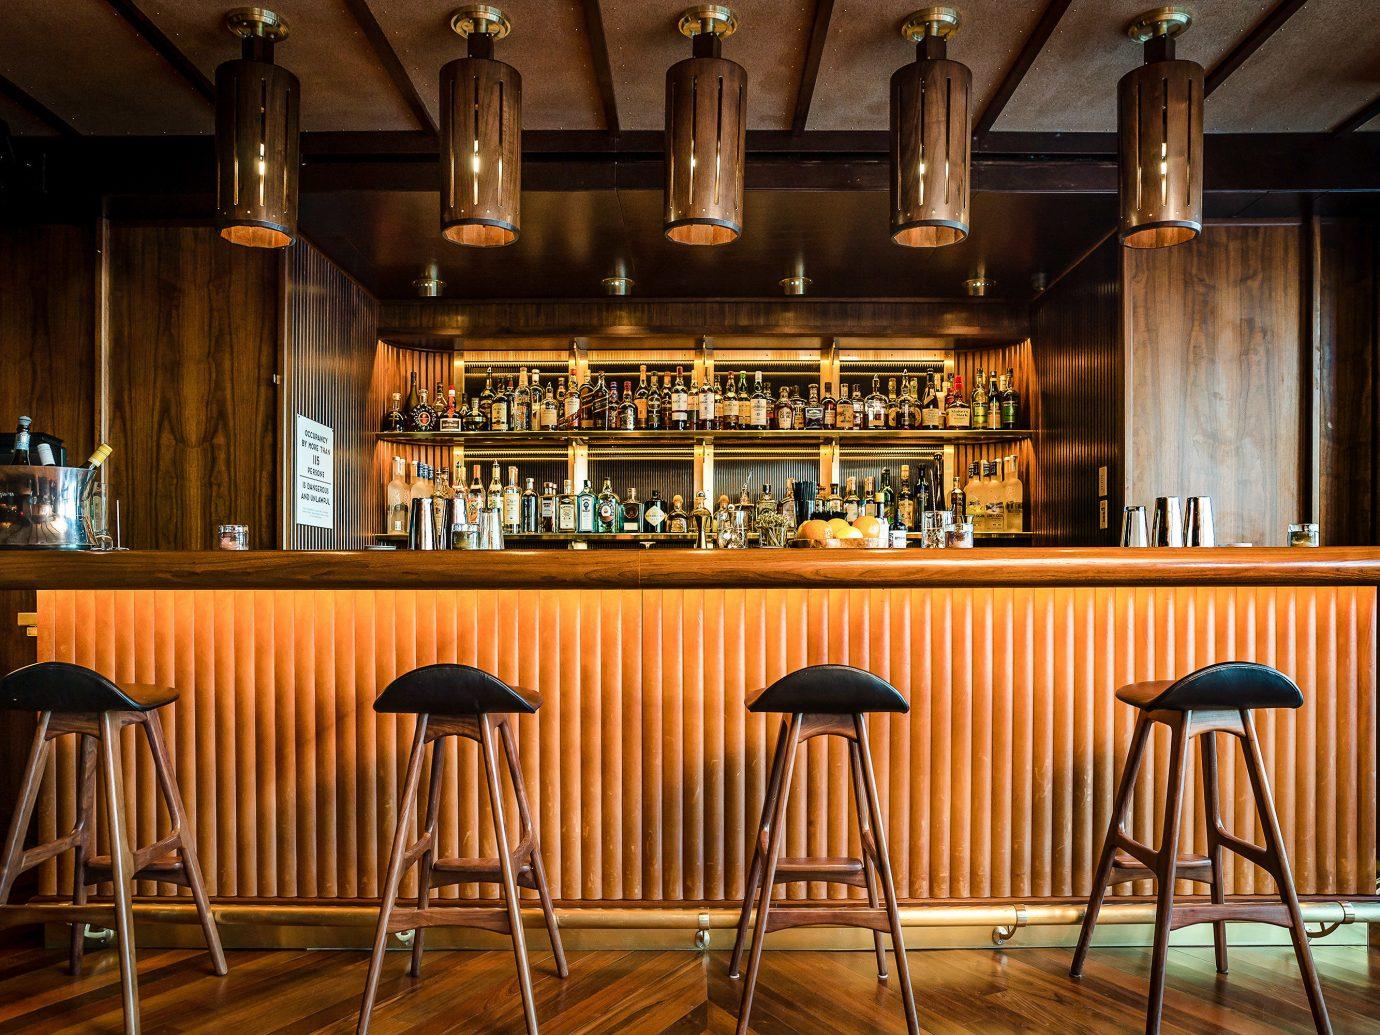 Boutique Hotels Food + Drink Hotels chair indoor floor Kitchen Bar interior design restaurant Dining café pub table tavern set